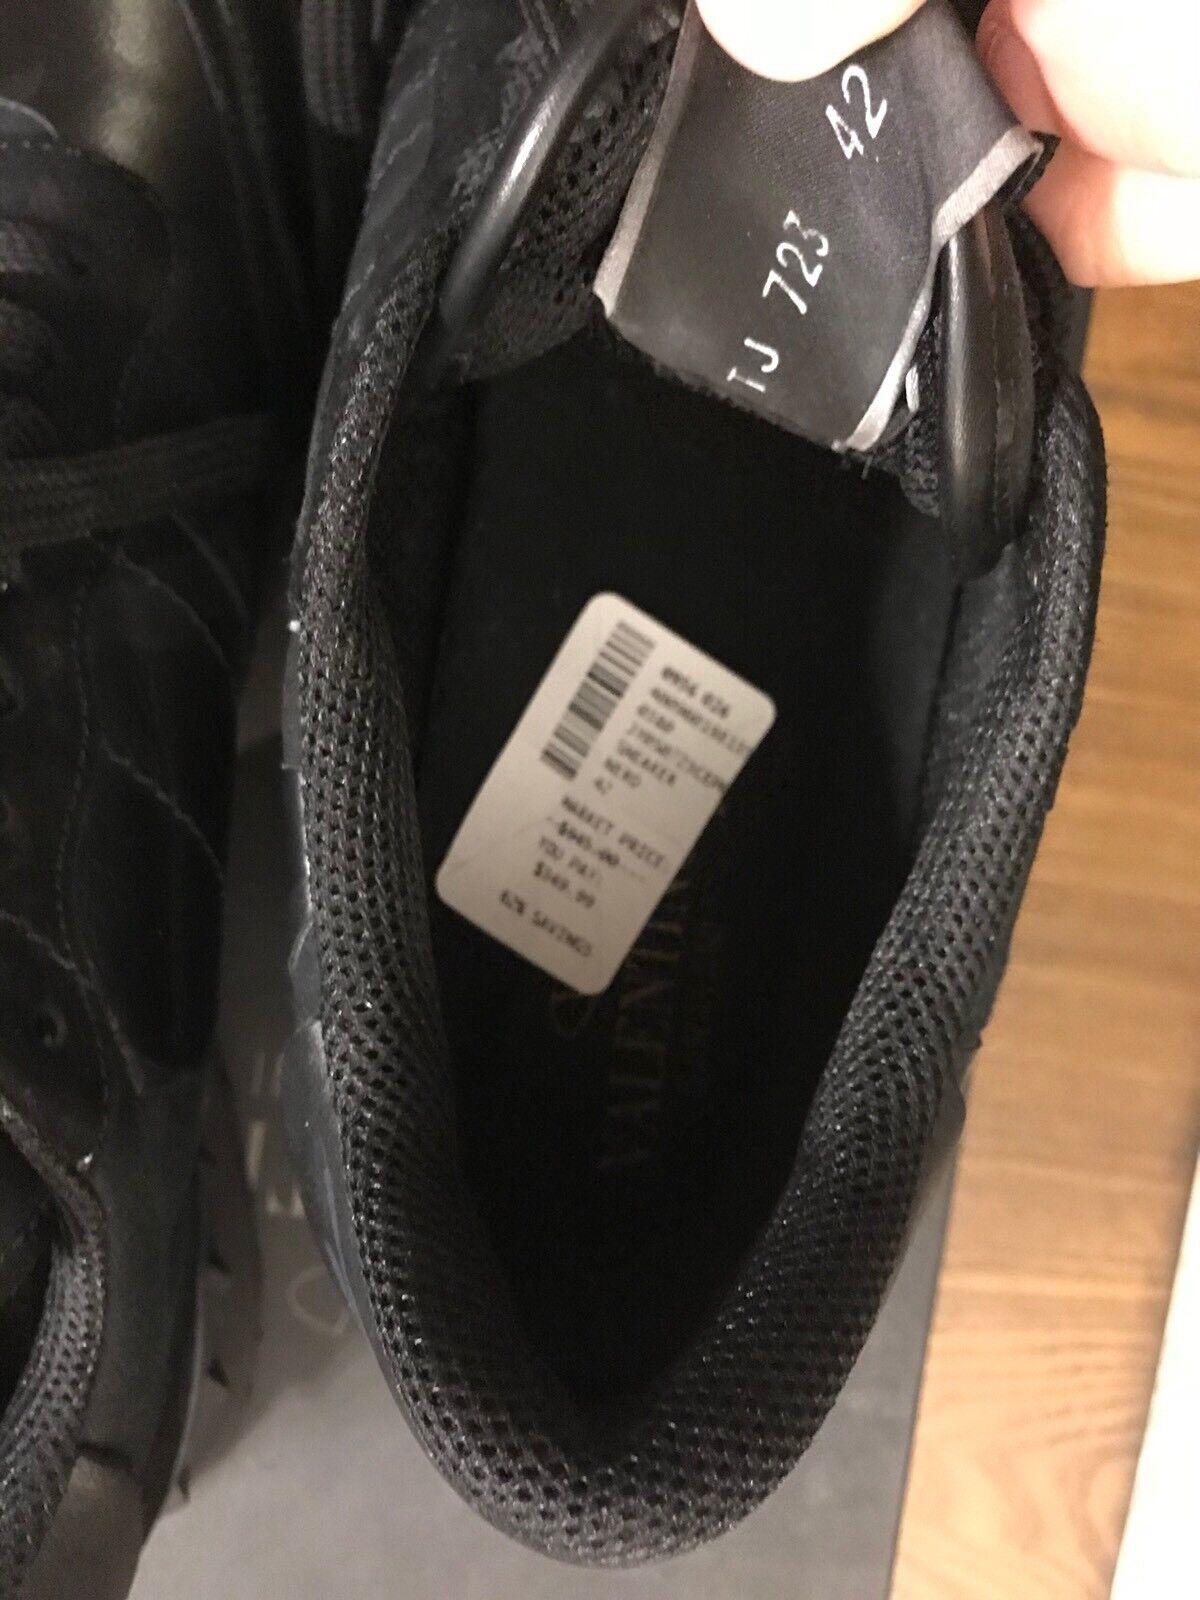 Nuevo Camuflaje Camo limitada Mirabilia Valentino rockrunner Negra Negra Negra De Hombre Zapato 9  995 8c1fca